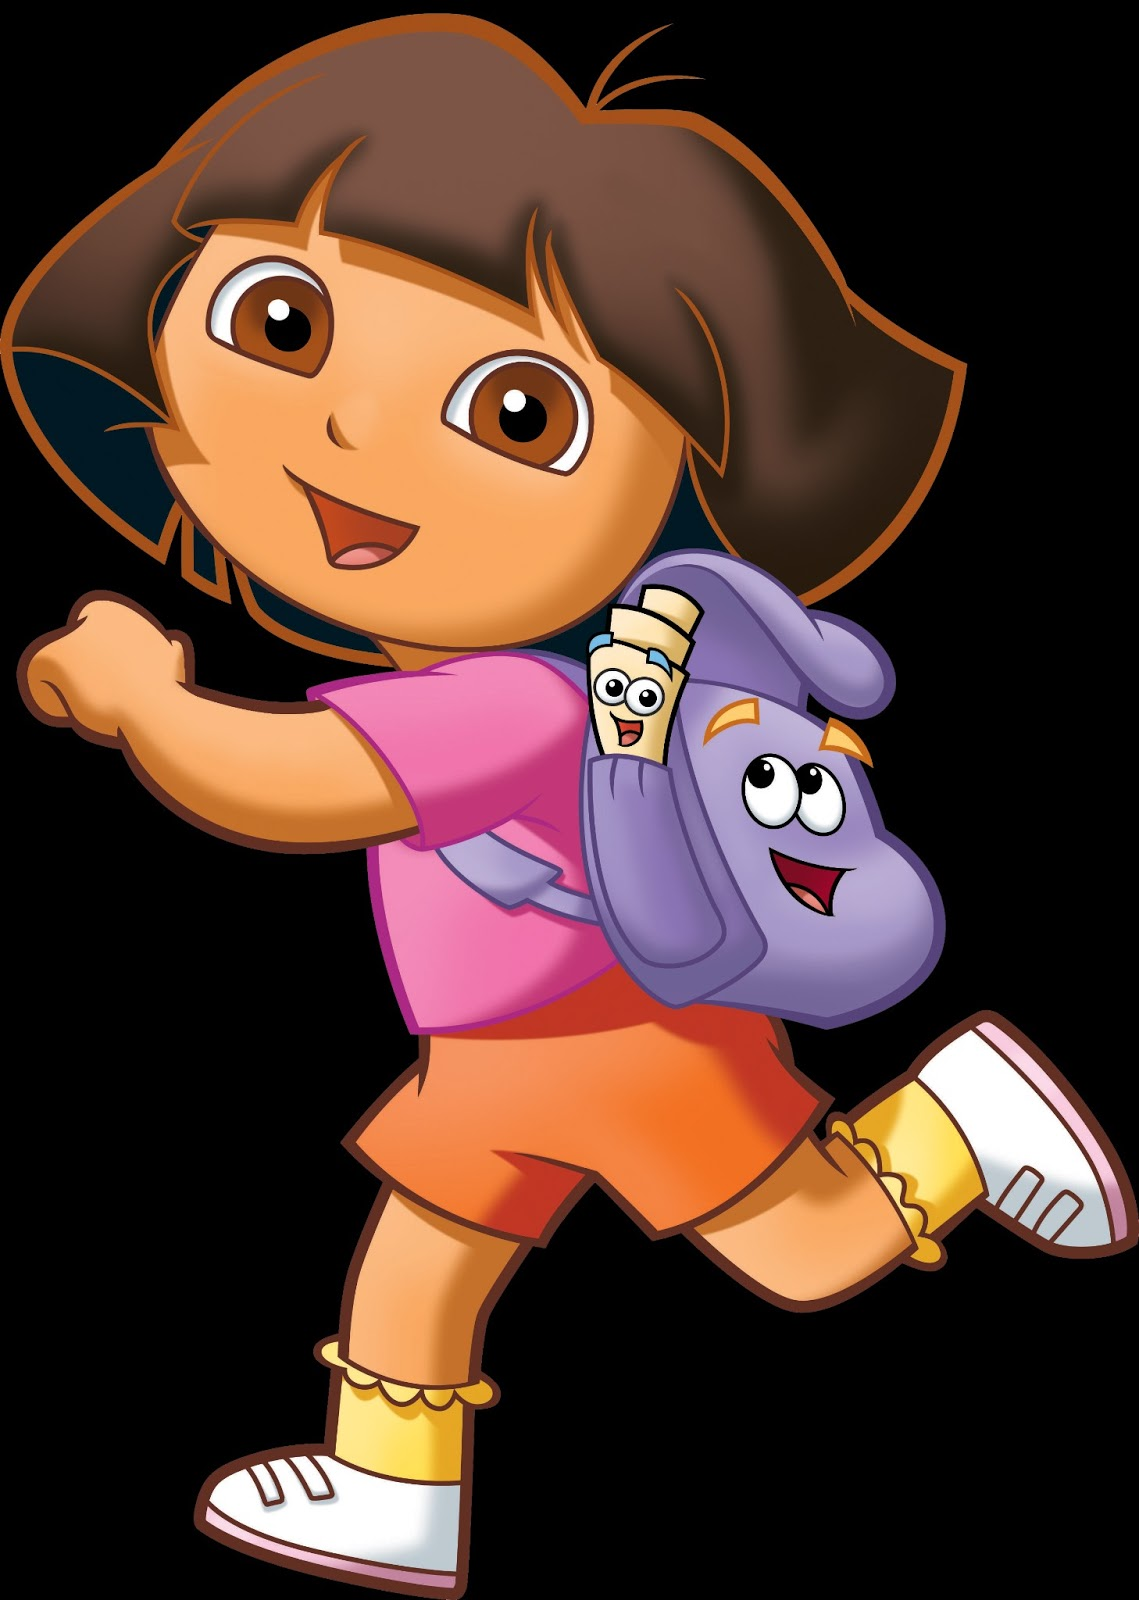 Cartoon Characters: Dora the Explorer images